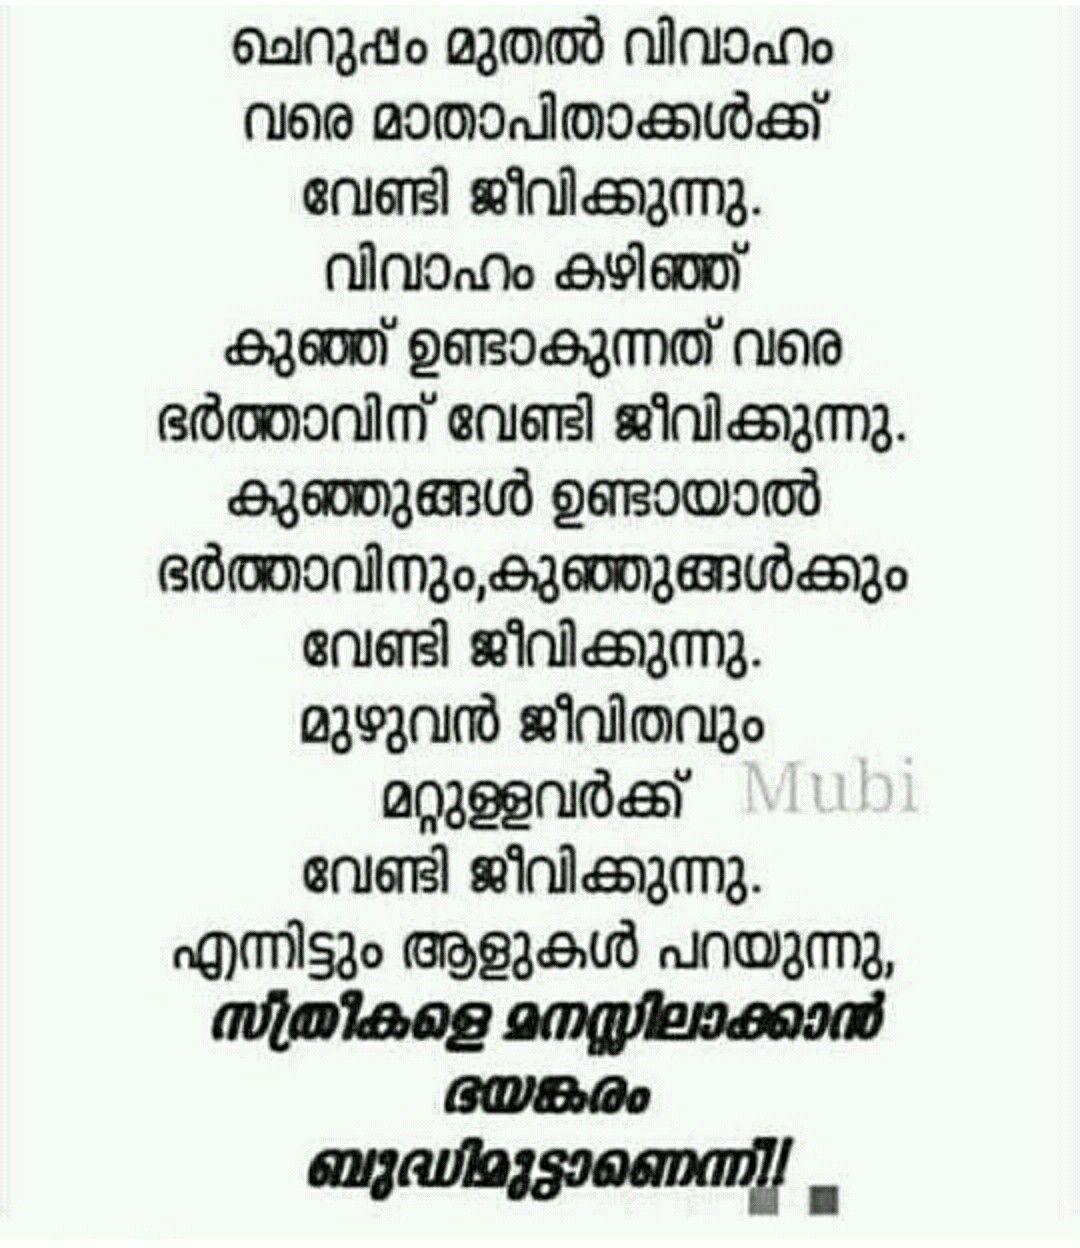 Pin by Sruthy Lakshmi on മലയാളം ചിന്തകൾ Malayalam quotes